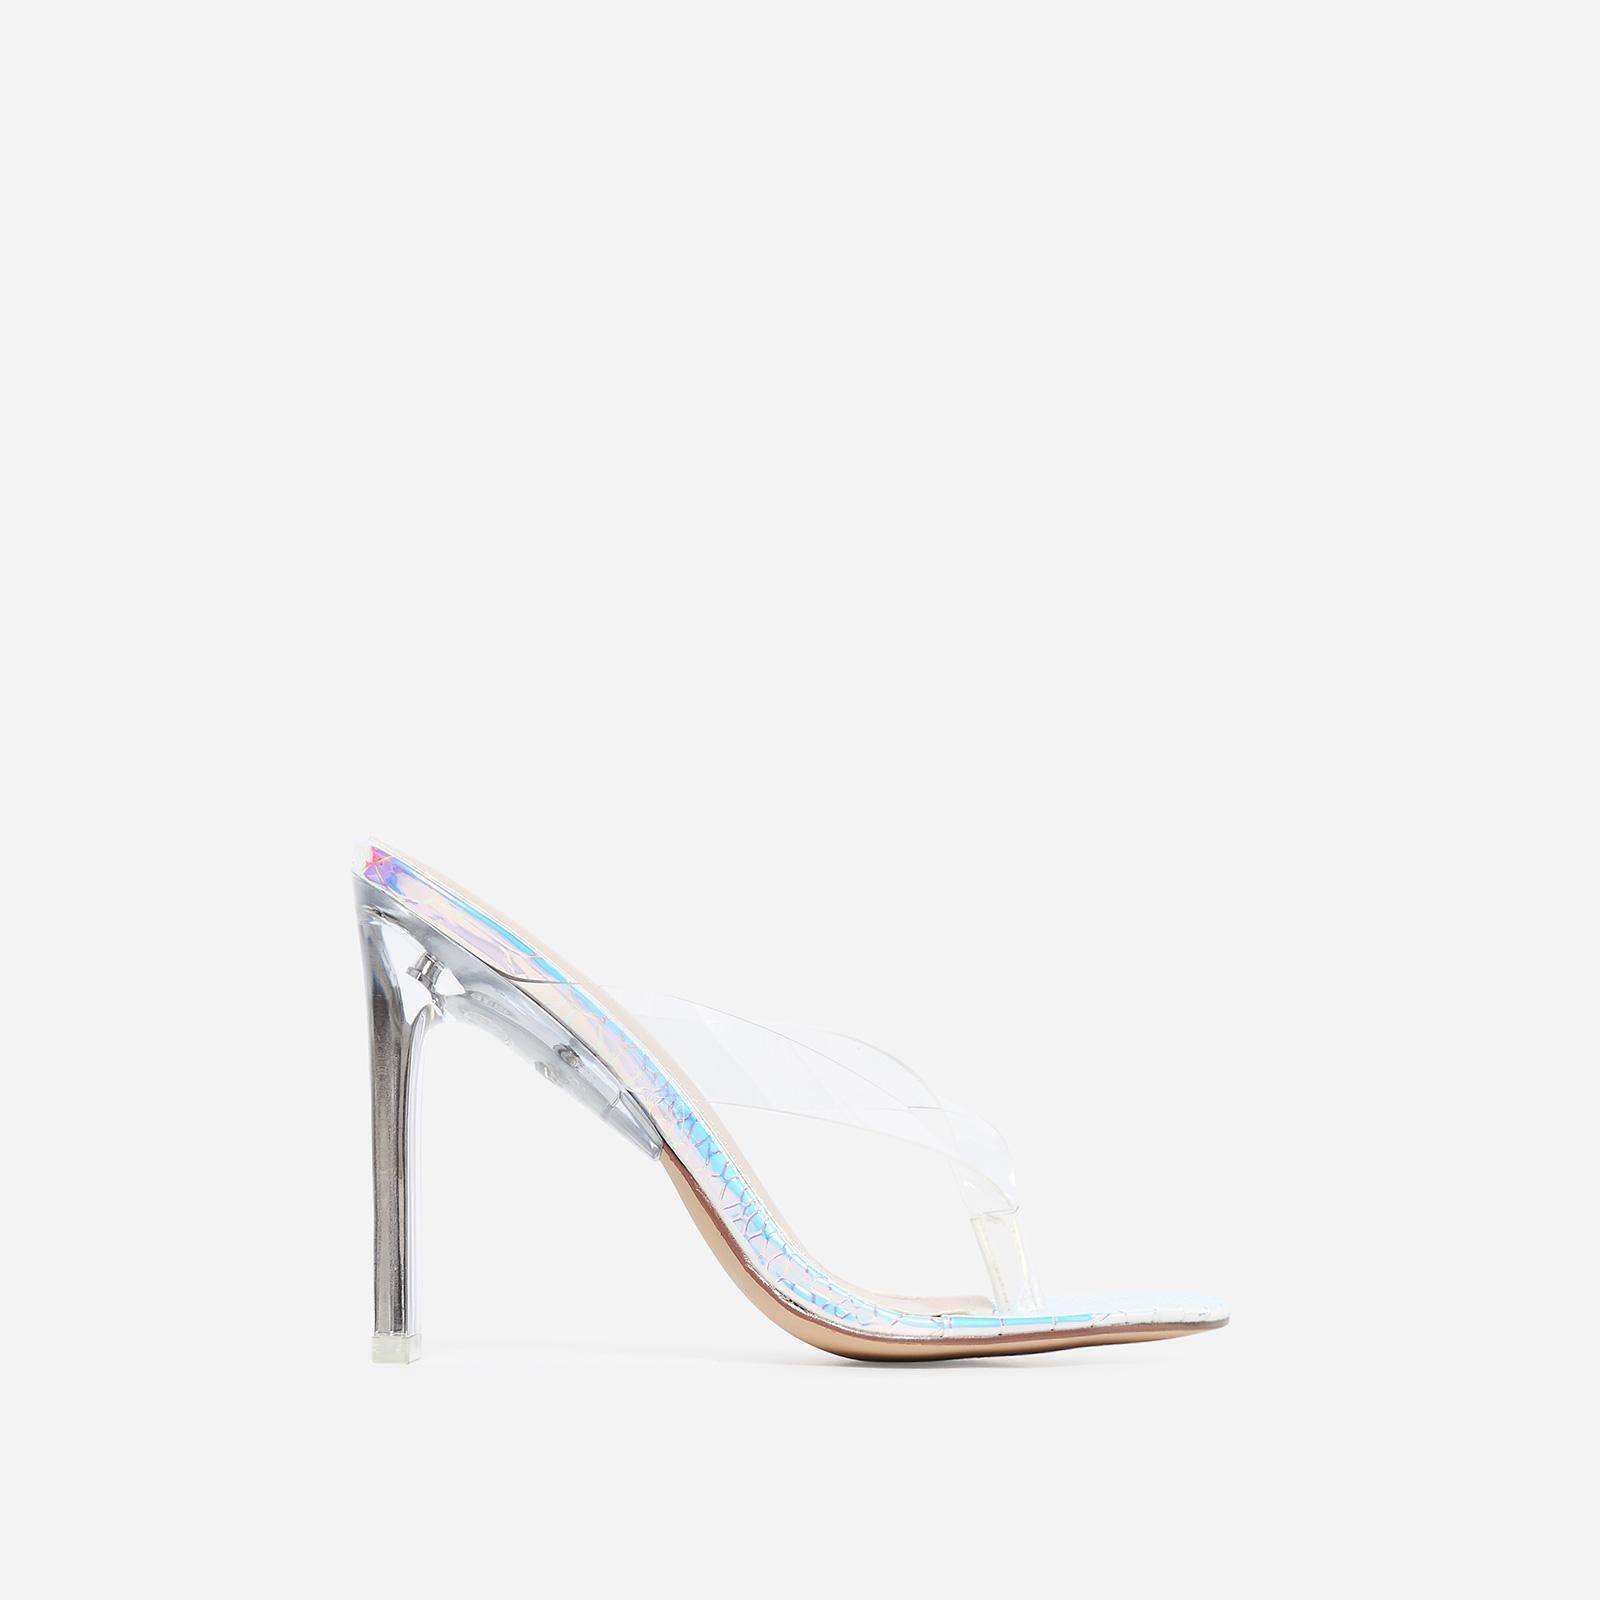 Scandal Flip Flop Flat Perspex Heel In Silver Snake Print Faux Leather